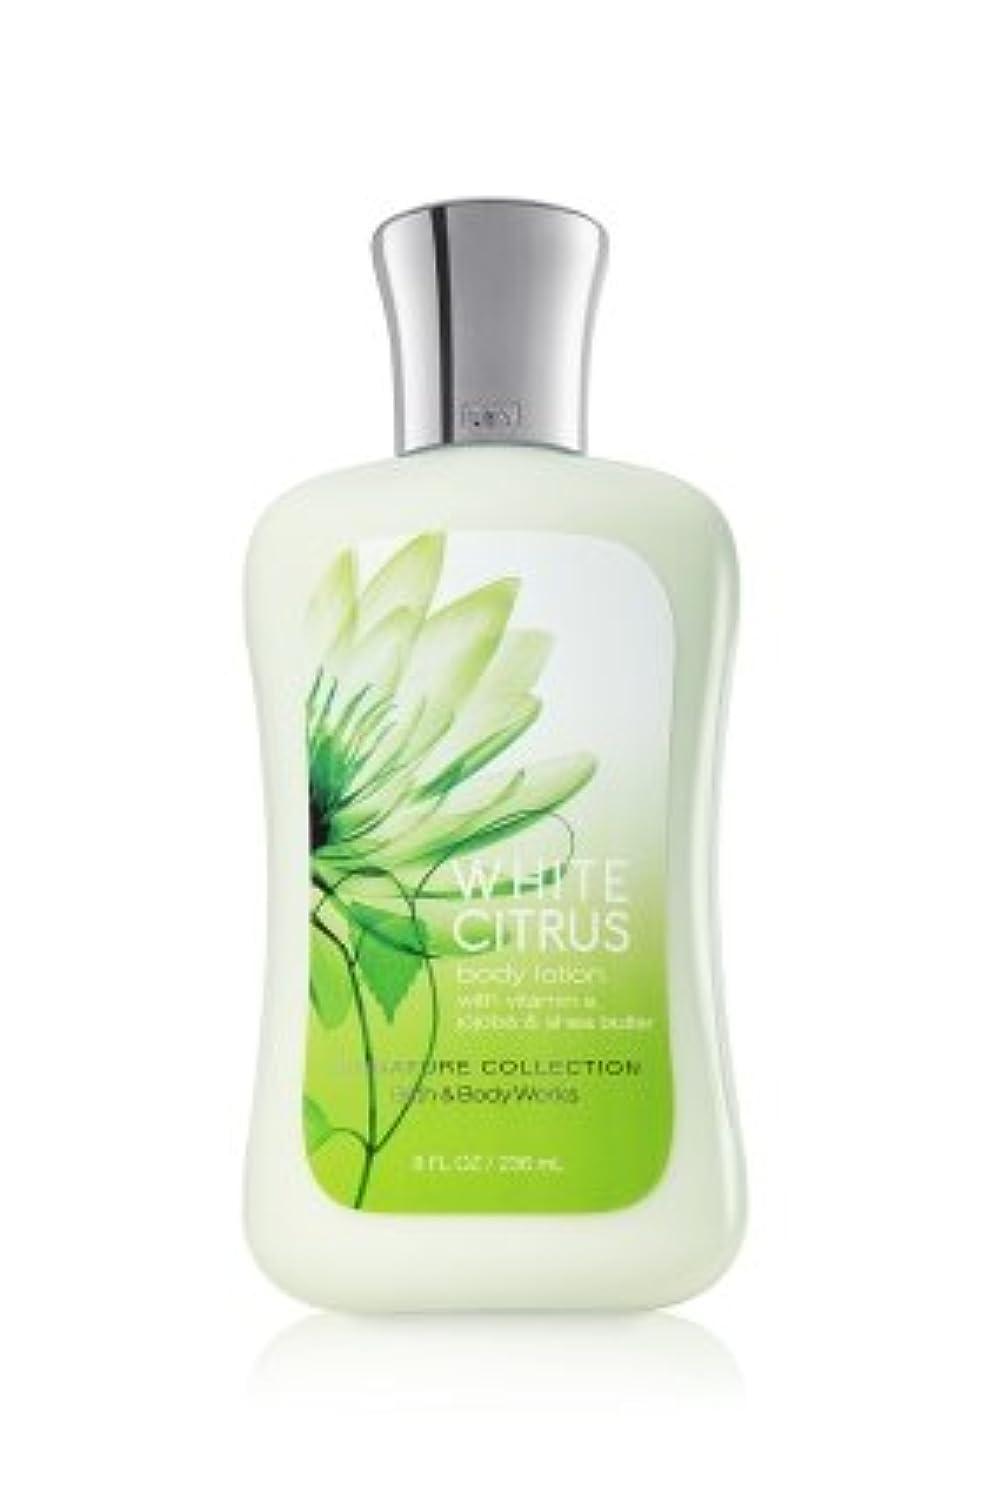 【Bath&Body Works / バスアンドボディワークス】ホワイトシトラス(White Citrus)ボディローション [海外直送品]